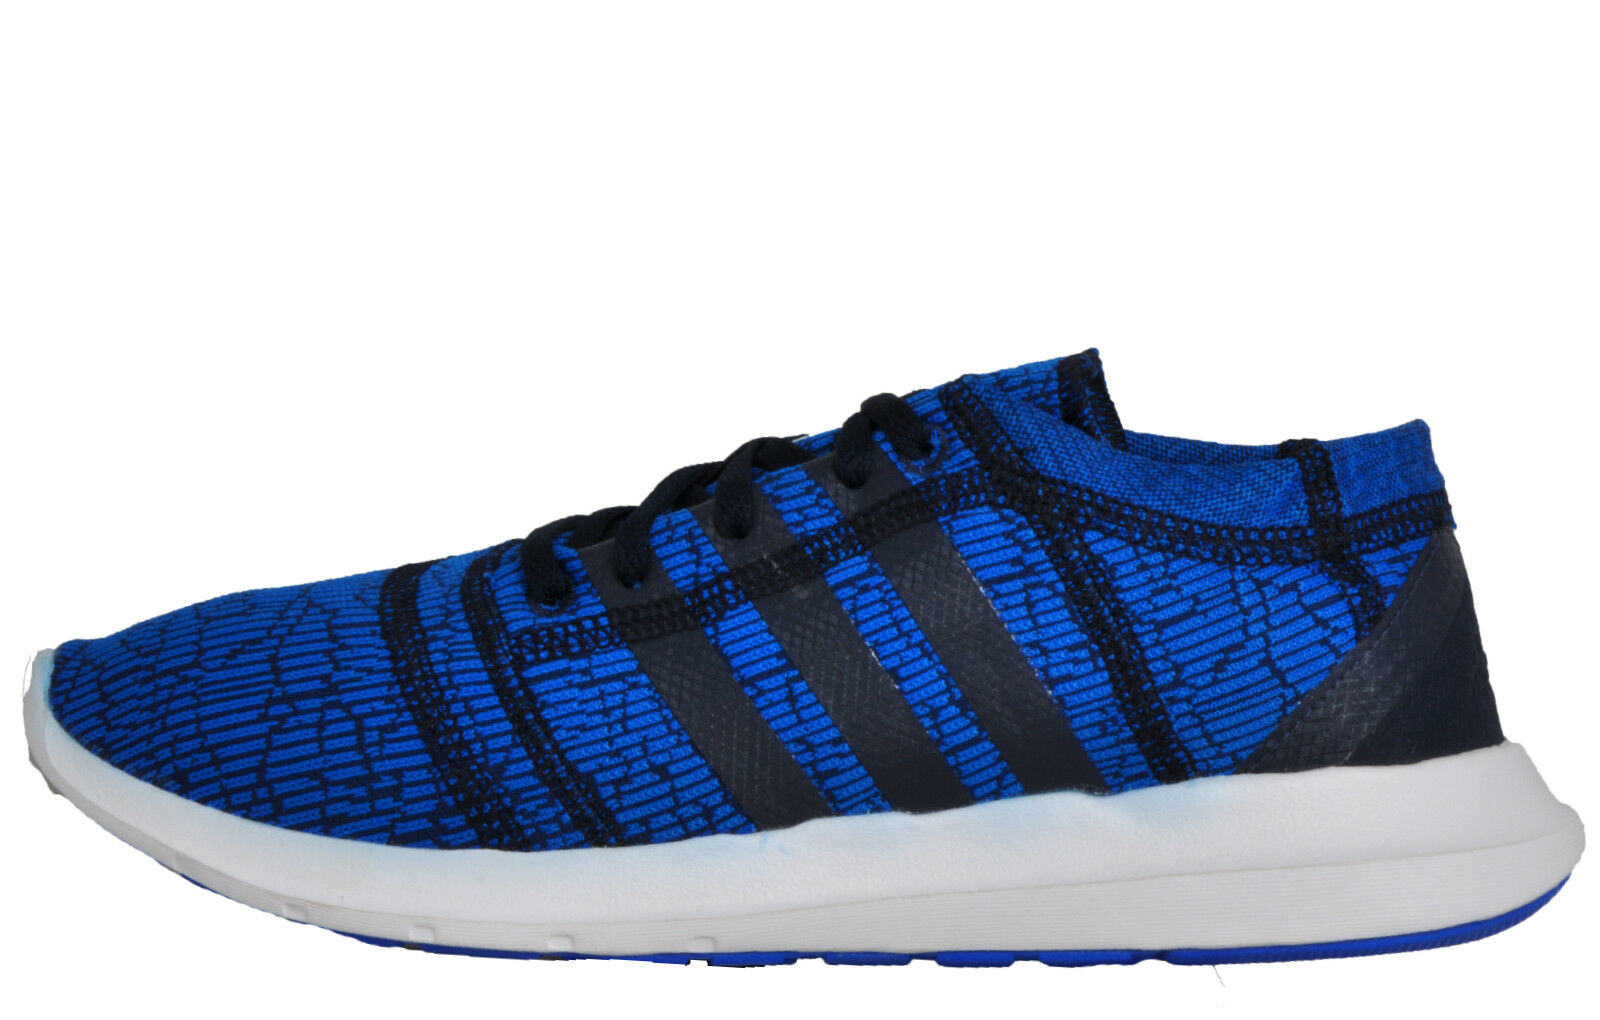 Adidas Element Refine 2 MP BB4923 bluee Running shoes Size UK 7 - 12